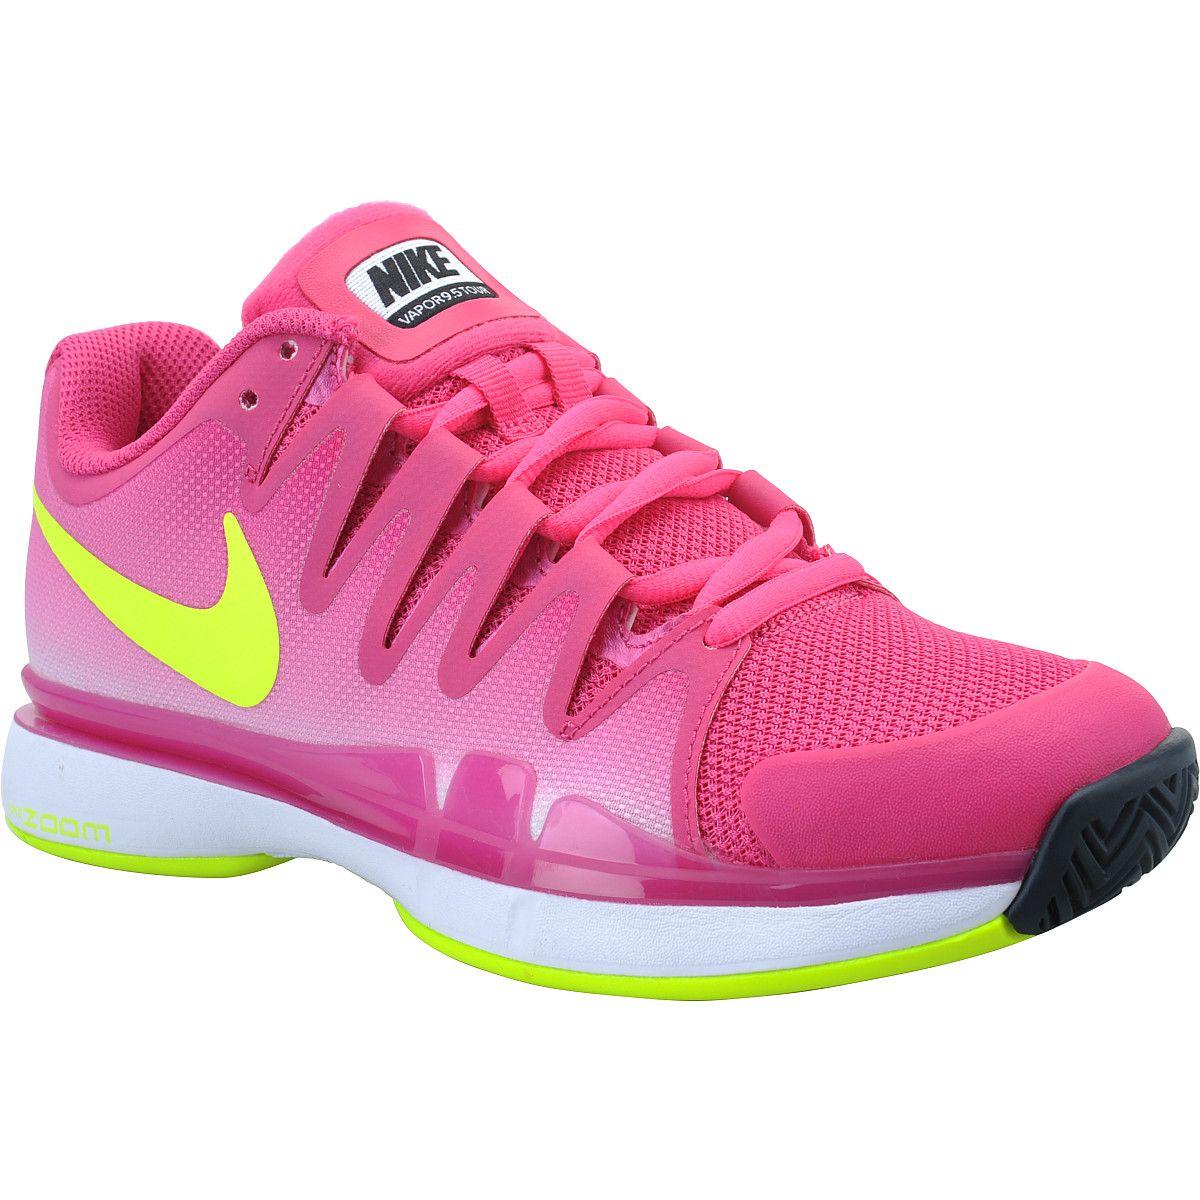 girls tennis shoes nike zoom 9.5 - Google Search